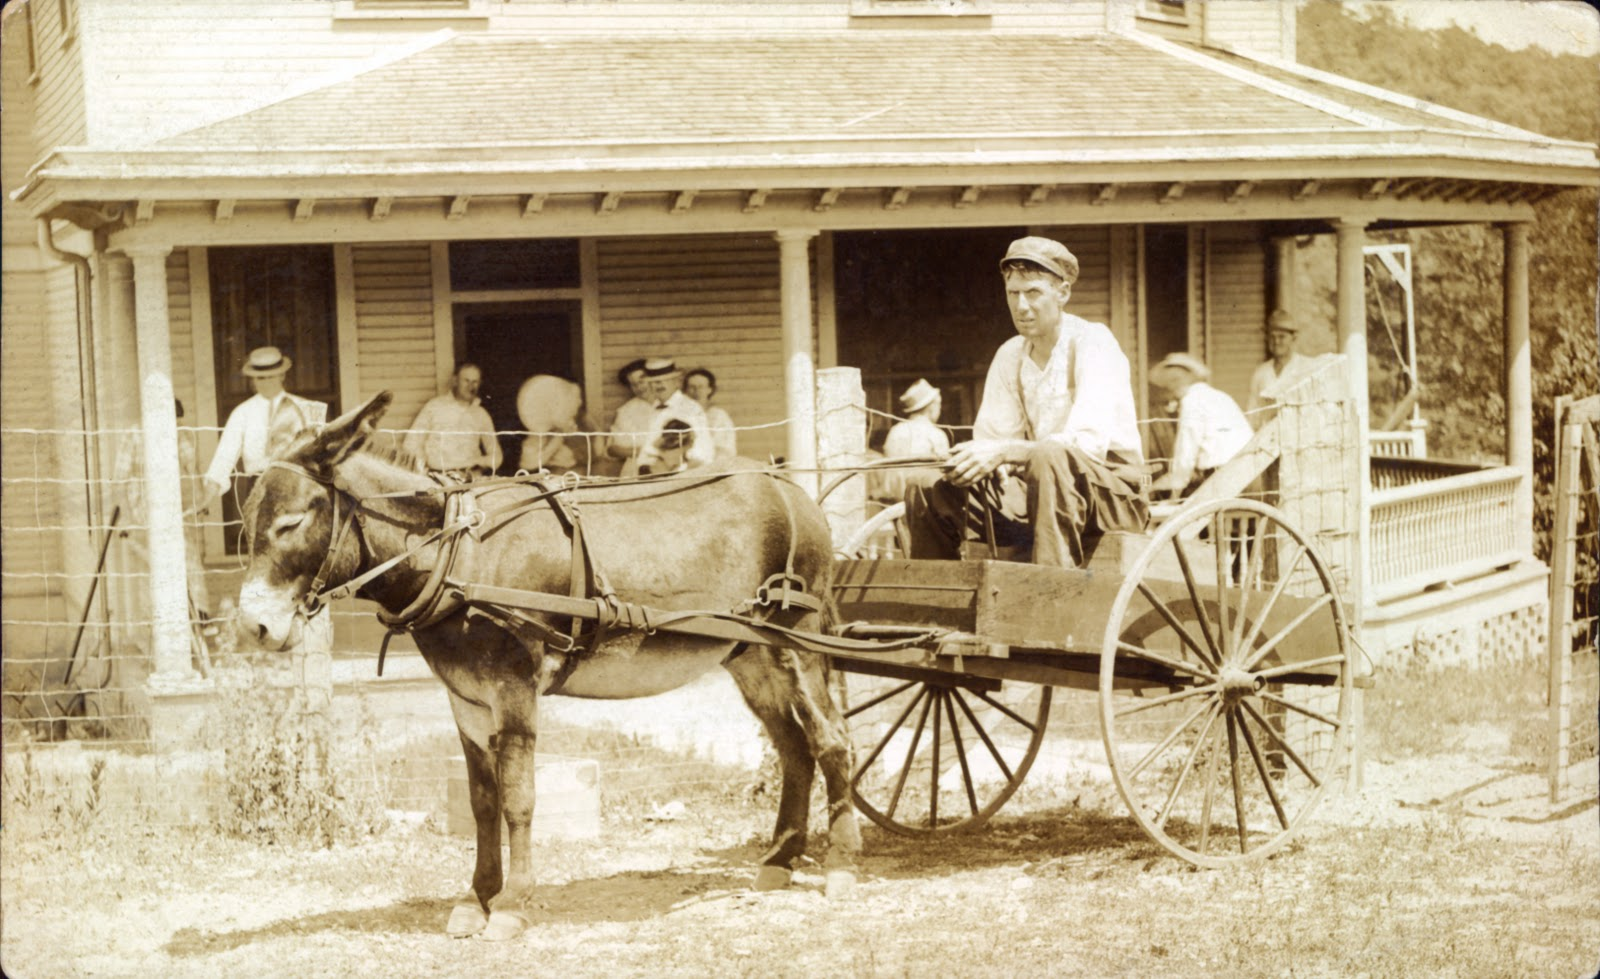 Illinois vermilion county fairmount - The Card Was Addressed To Eli Runyan In Danville Illinois Eli Was Married To Dora Jane Allman Eli Allman S Sister